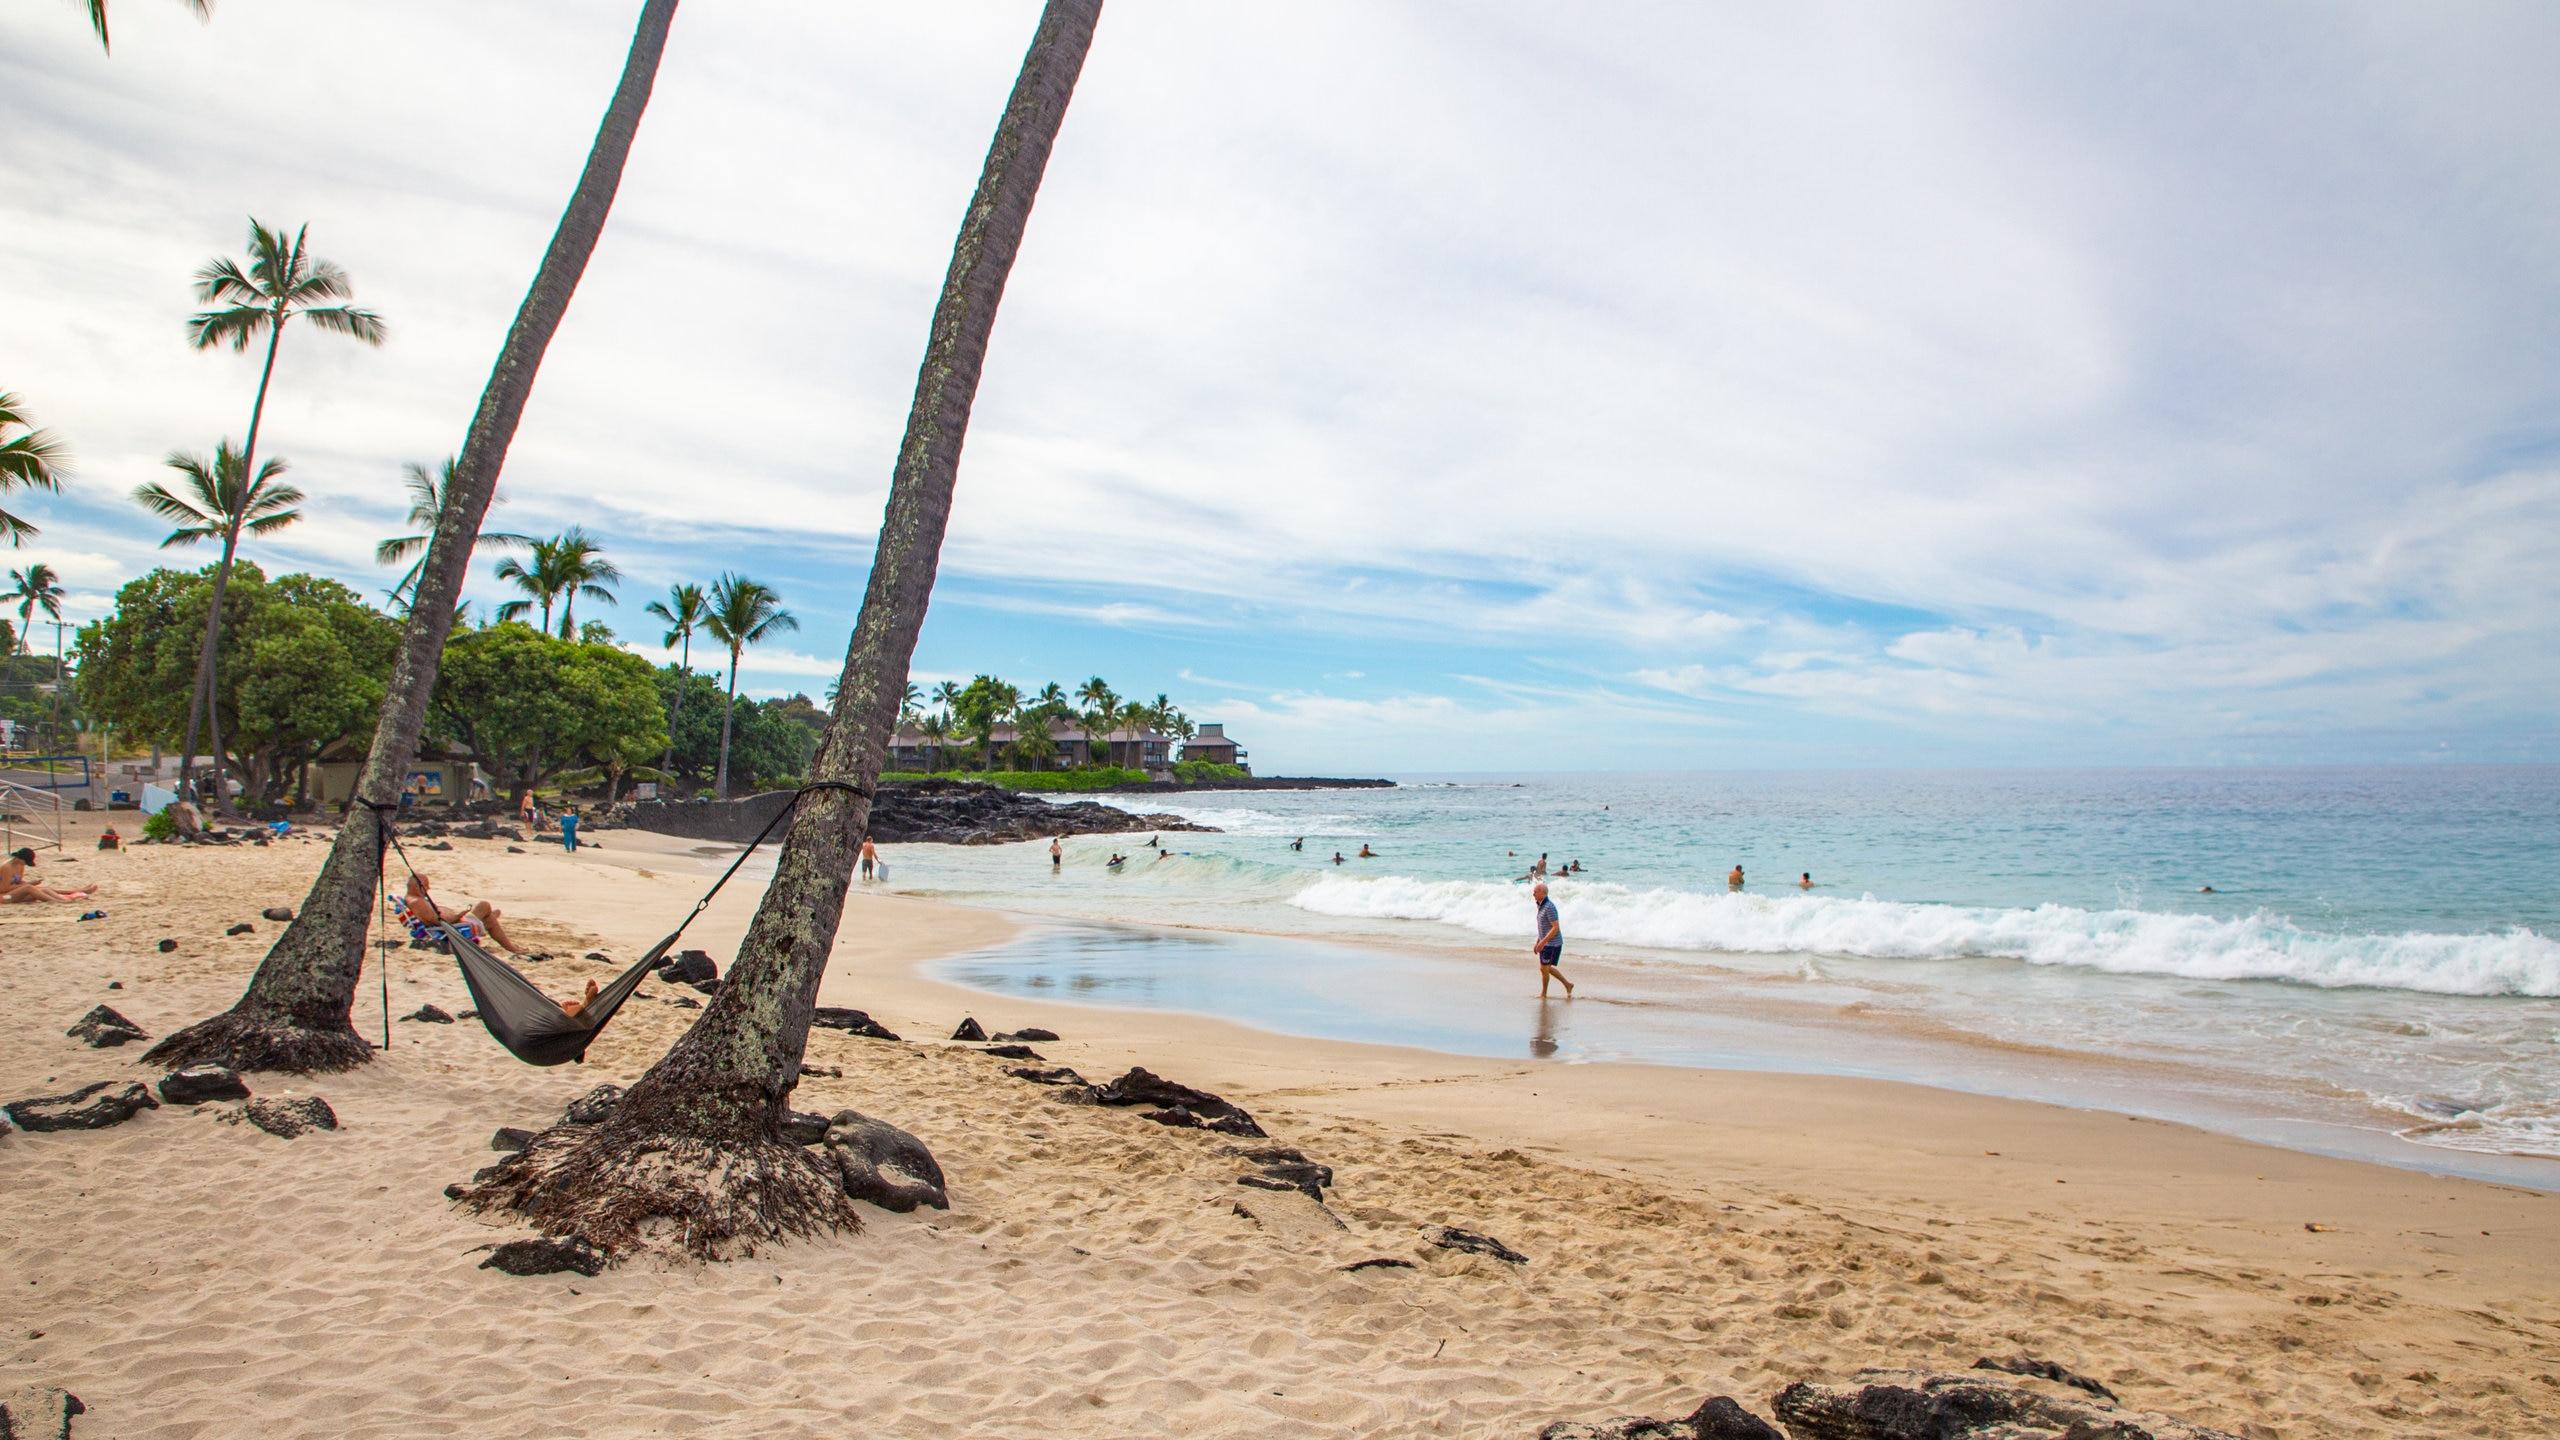 Magic Sands Beach, Kailua-Kona, Hawaii, United States of America